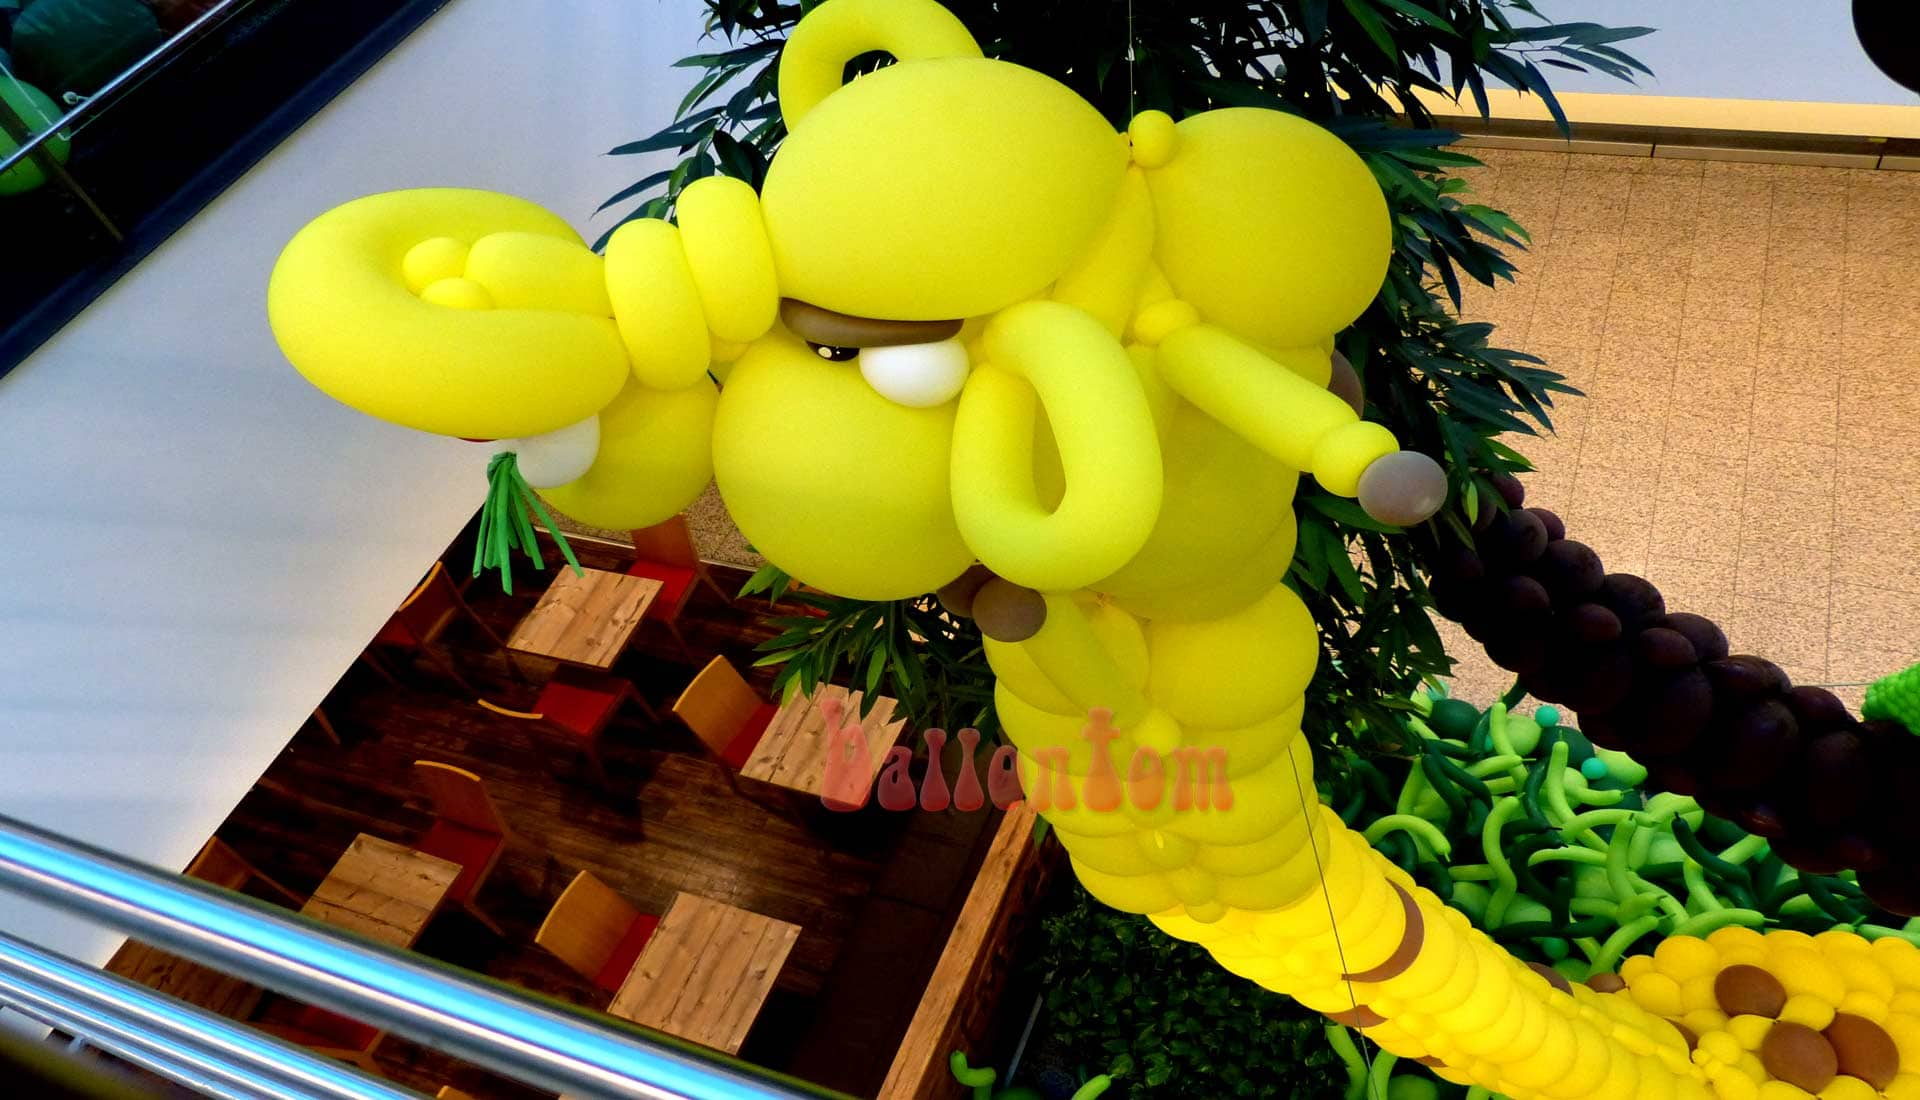 Ballonwelt im Rathauscenter Pankow in Berlin - Moto: Auf Safarie in Pankow - Bild: Giraffe